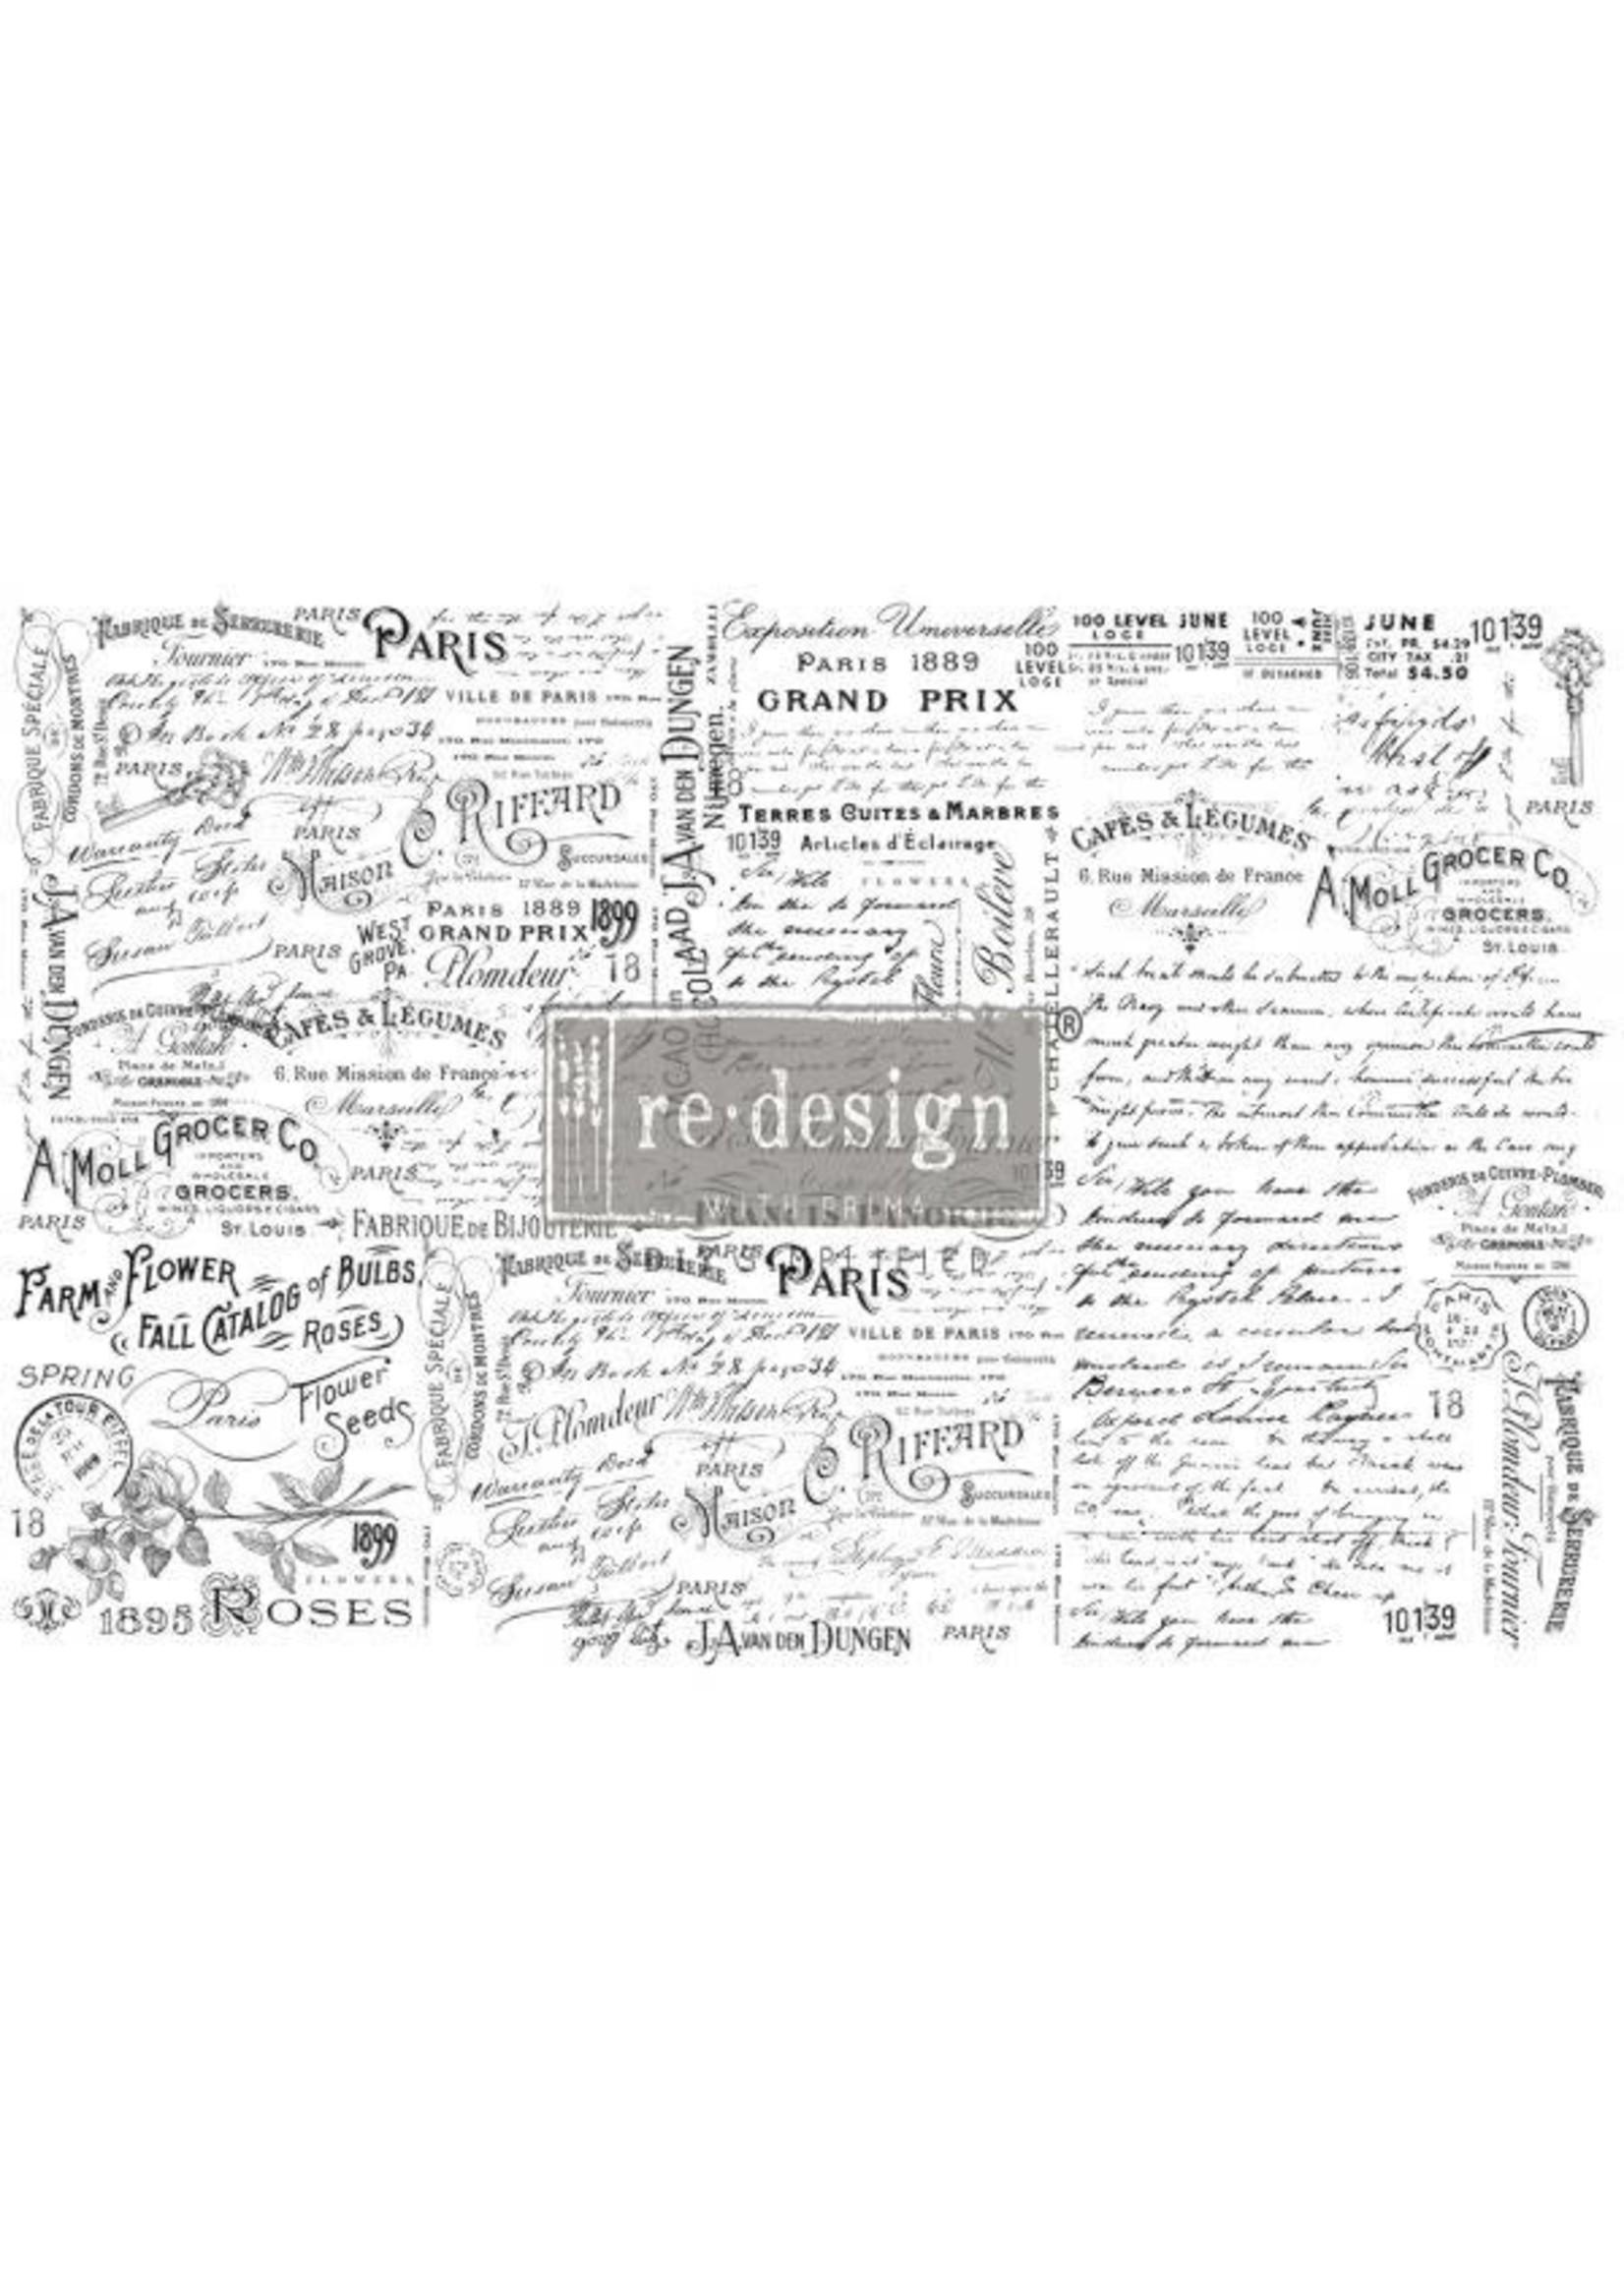 Re-Design with Prima® Zoey Re·Design with Prima® Decoupage Tissue Paper